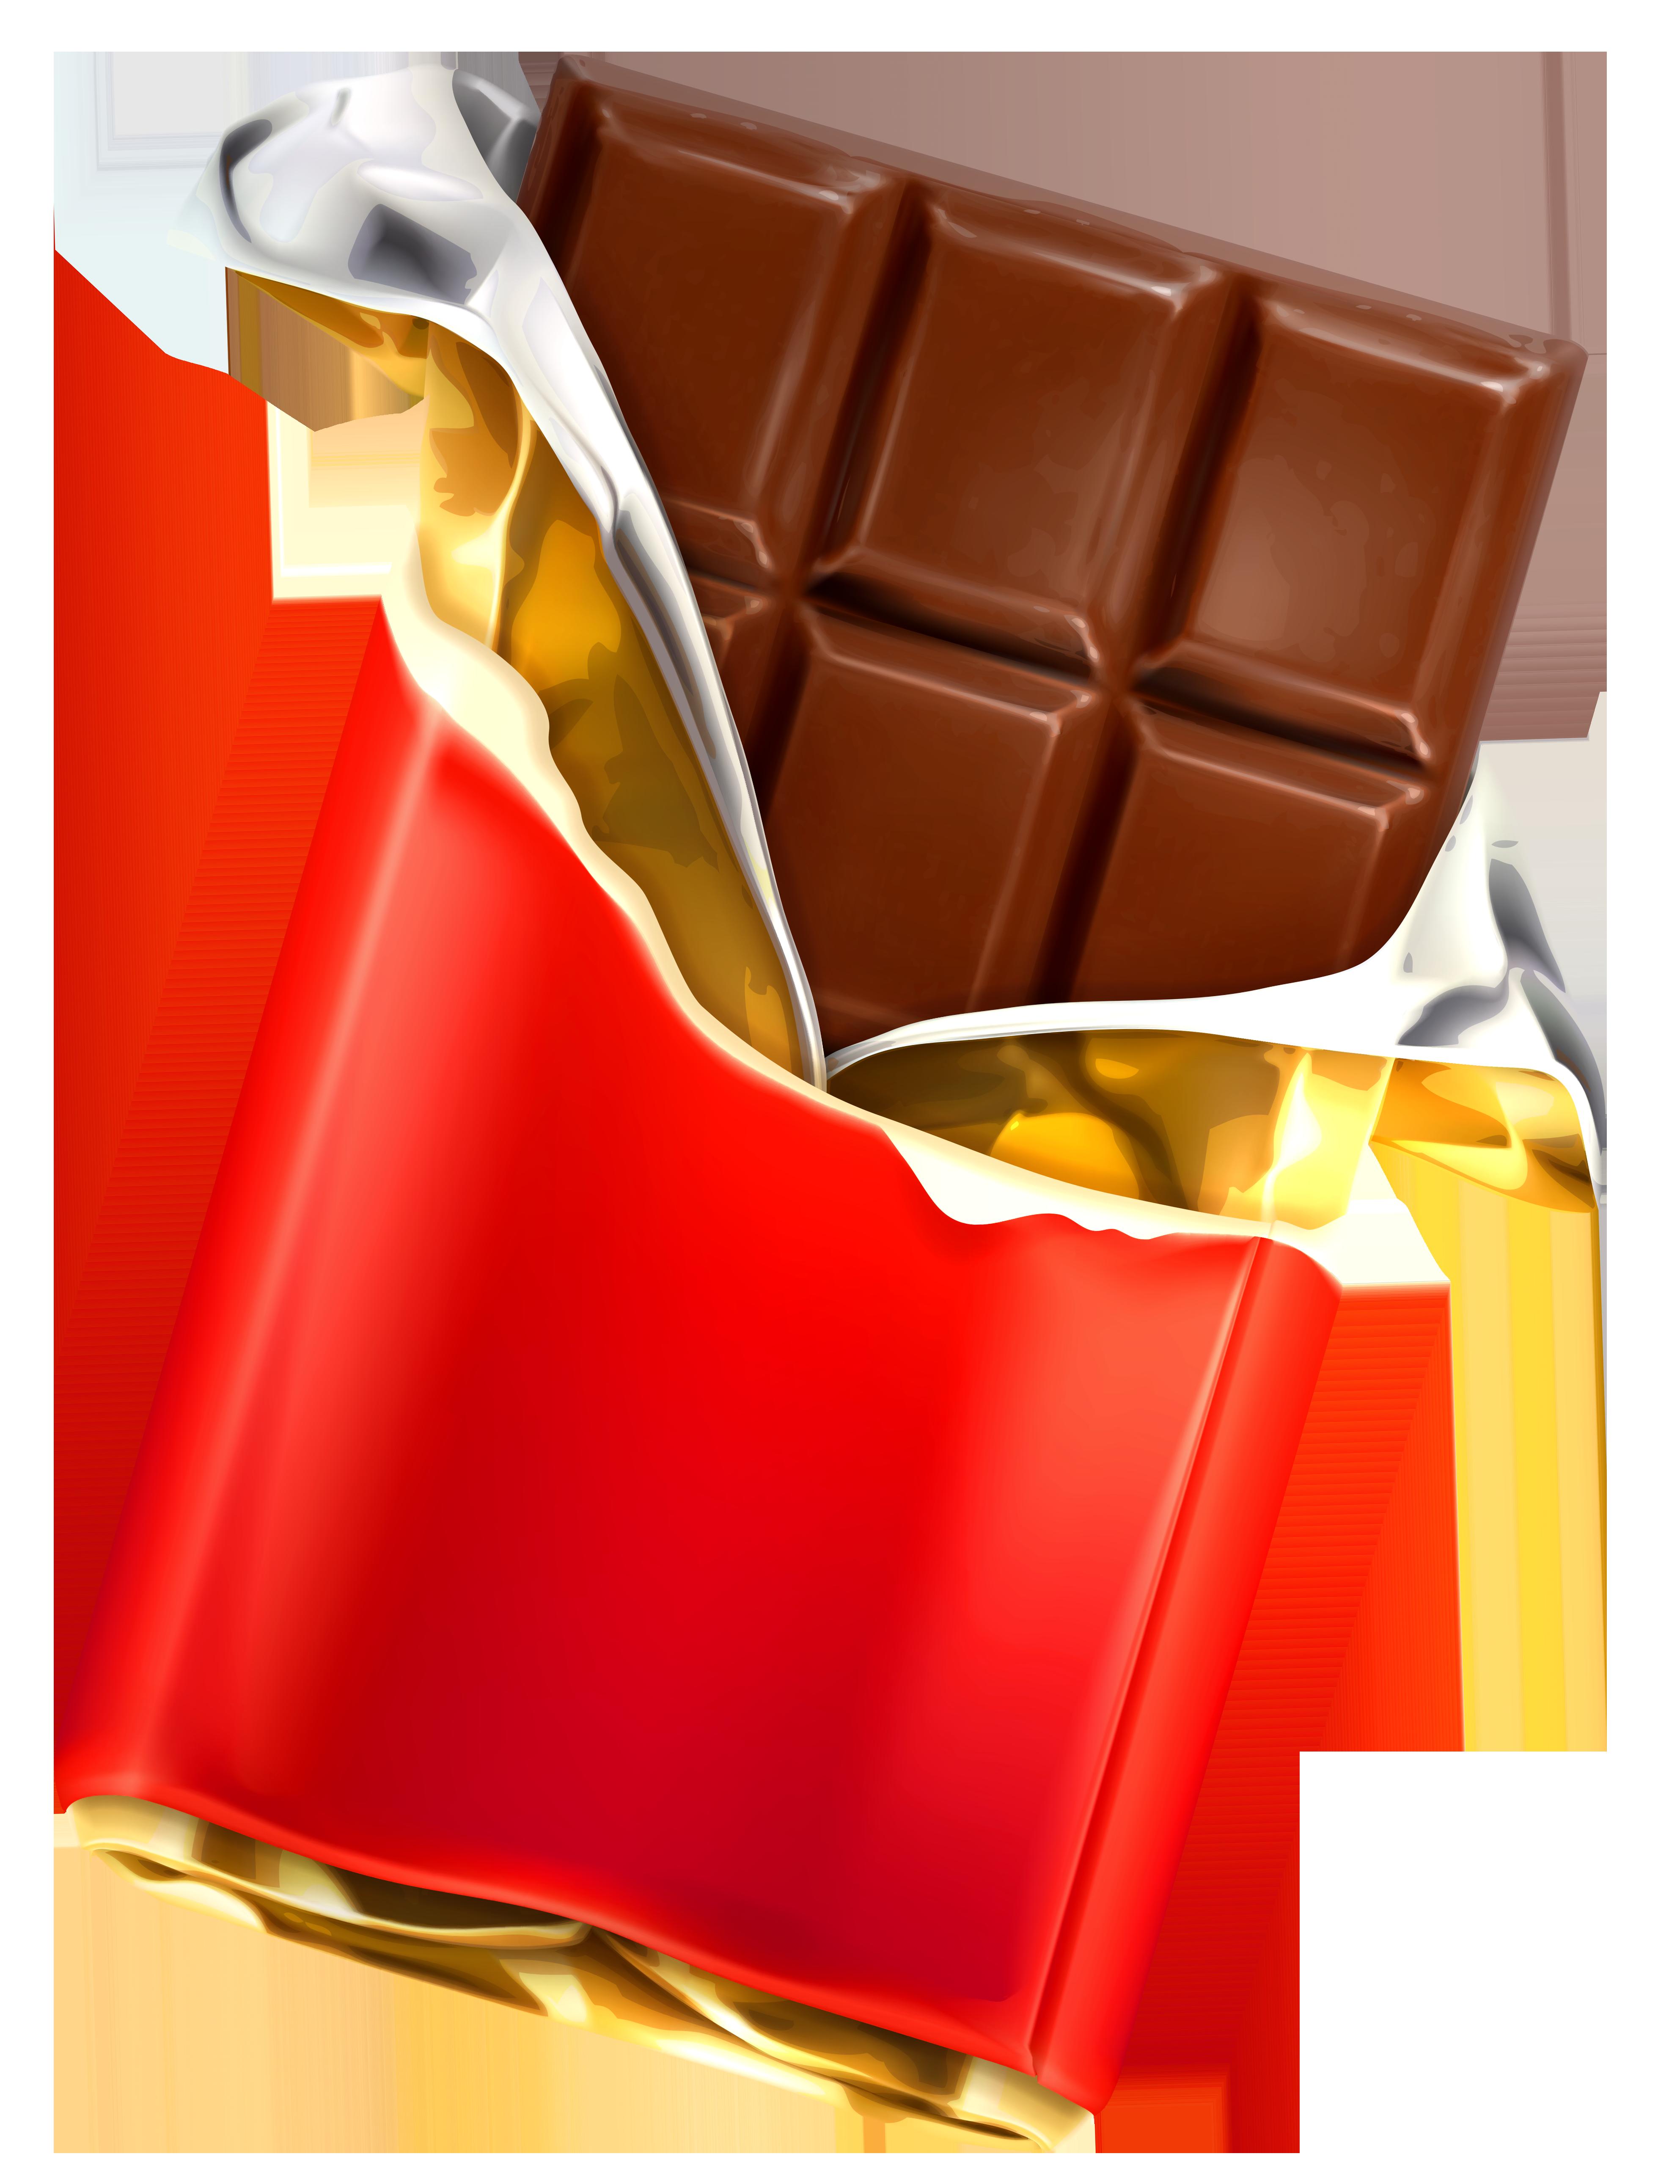 Chocolate clipart image-Chocolate clipart image-14